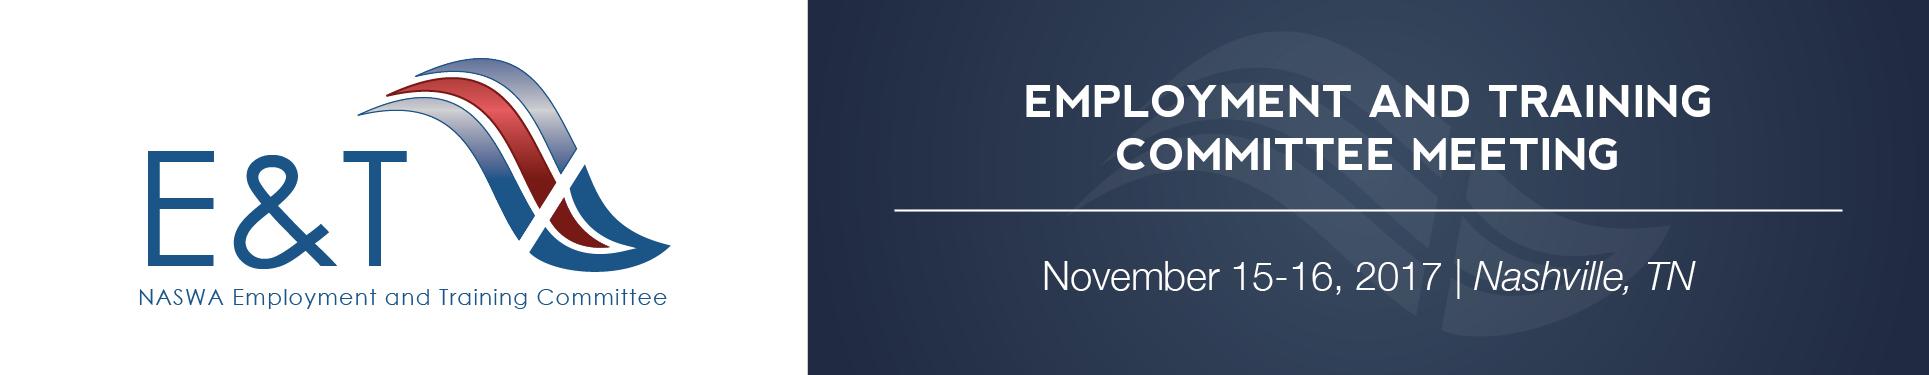 Employment & Training Committee Meeting (Nov. 2017)